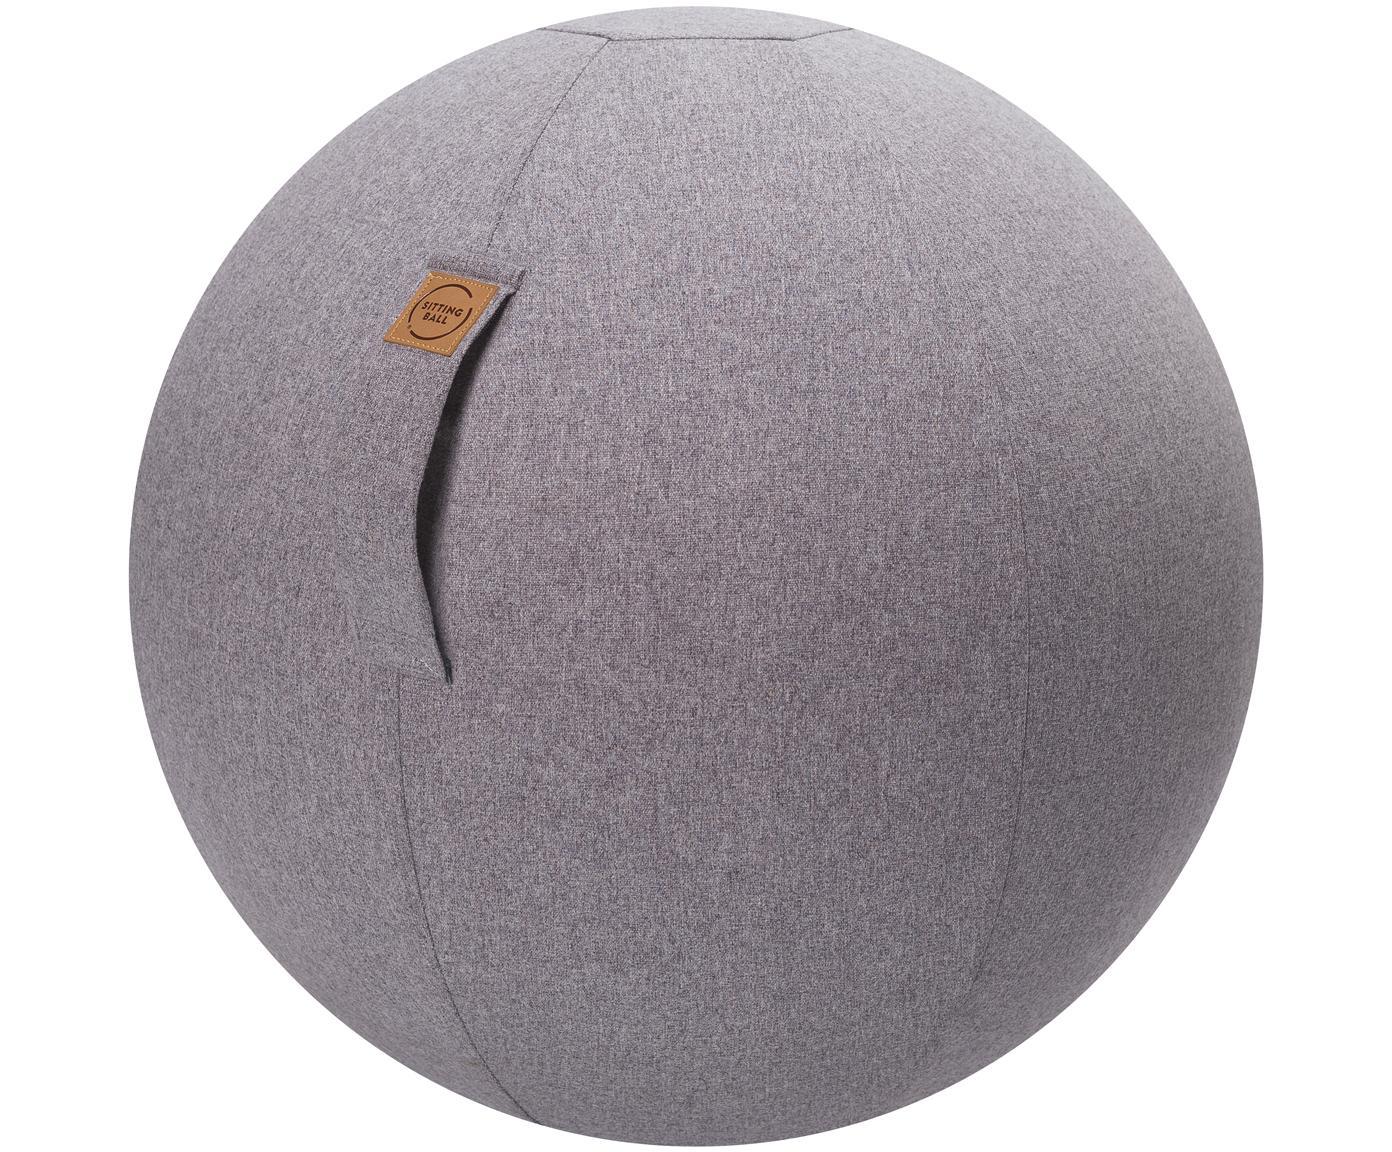 Zitbal Felt, Bekleding: polyester (imitatievilt), Lichtgrijs, Ø 65 cm